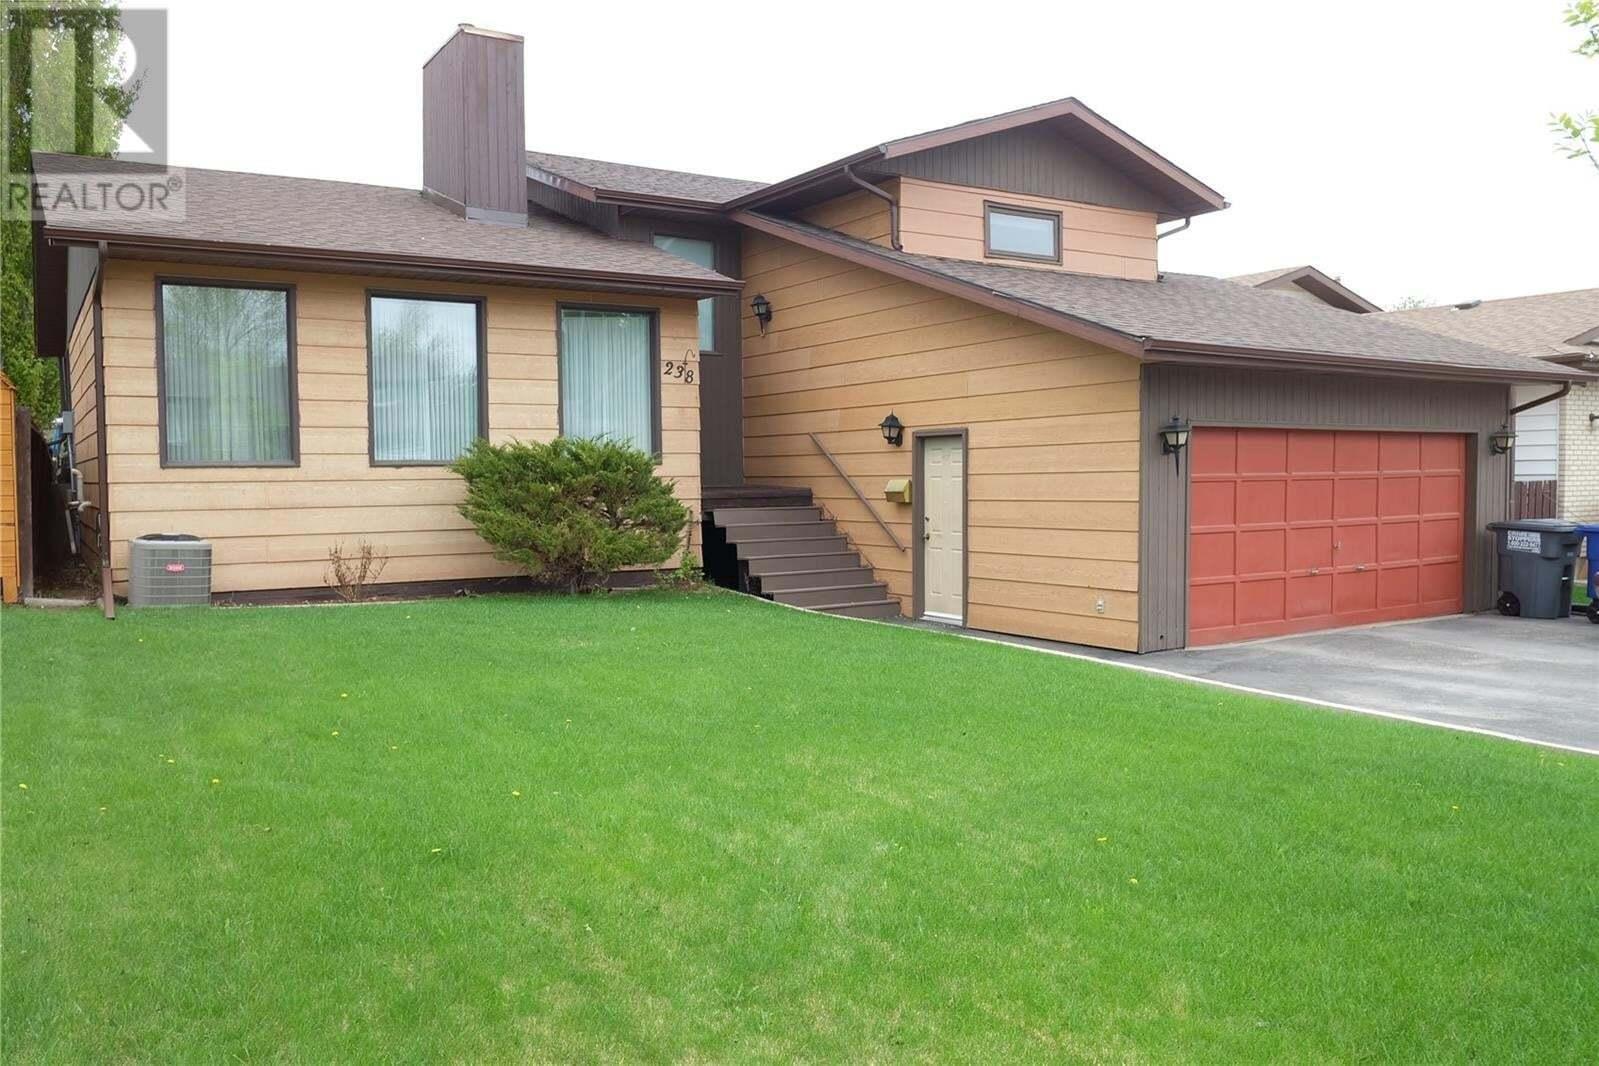 House for sale at 238 Thain Wy Saskatoon Saskatchewan - MLS: SK809615